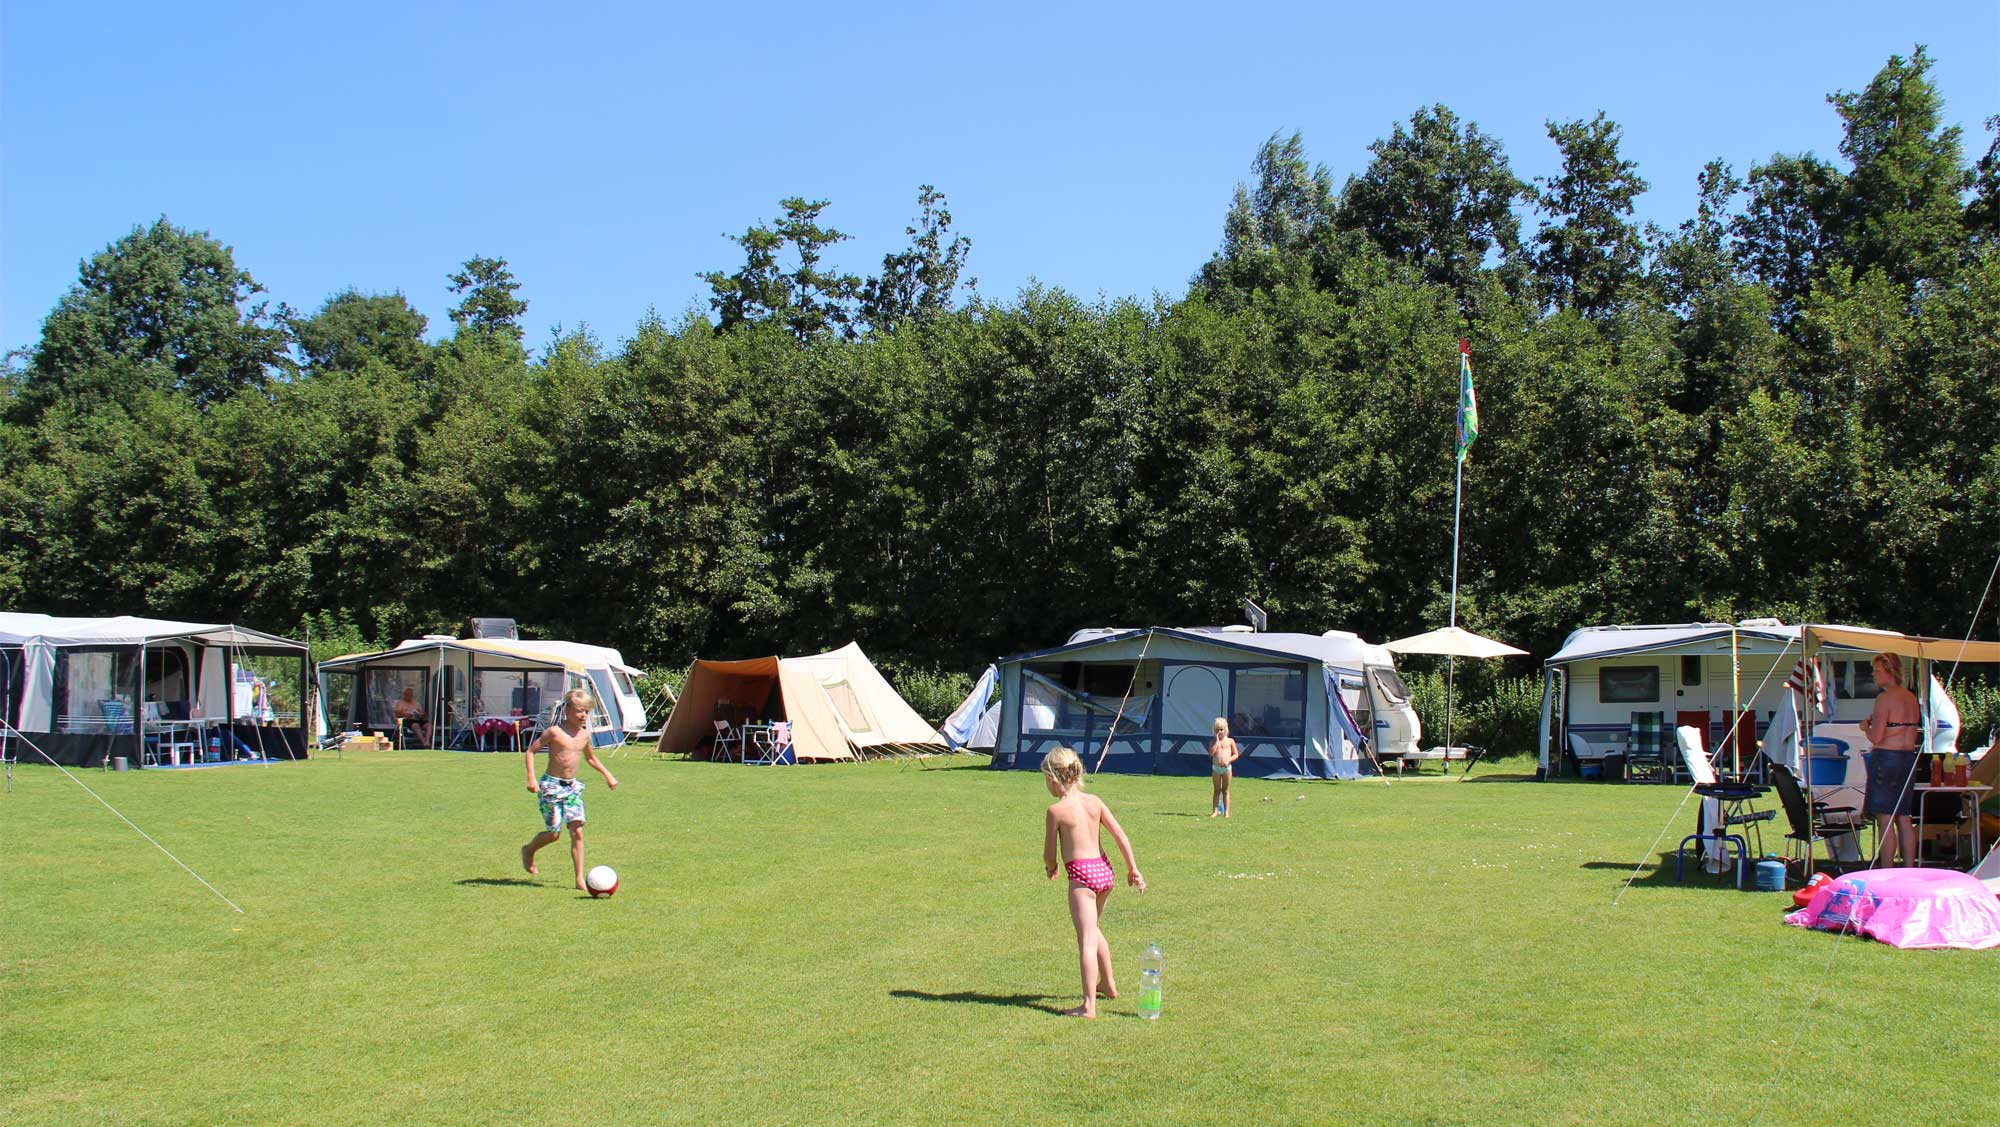 Seizoenplaats kamperen Molecaten Park Flevostrand 02